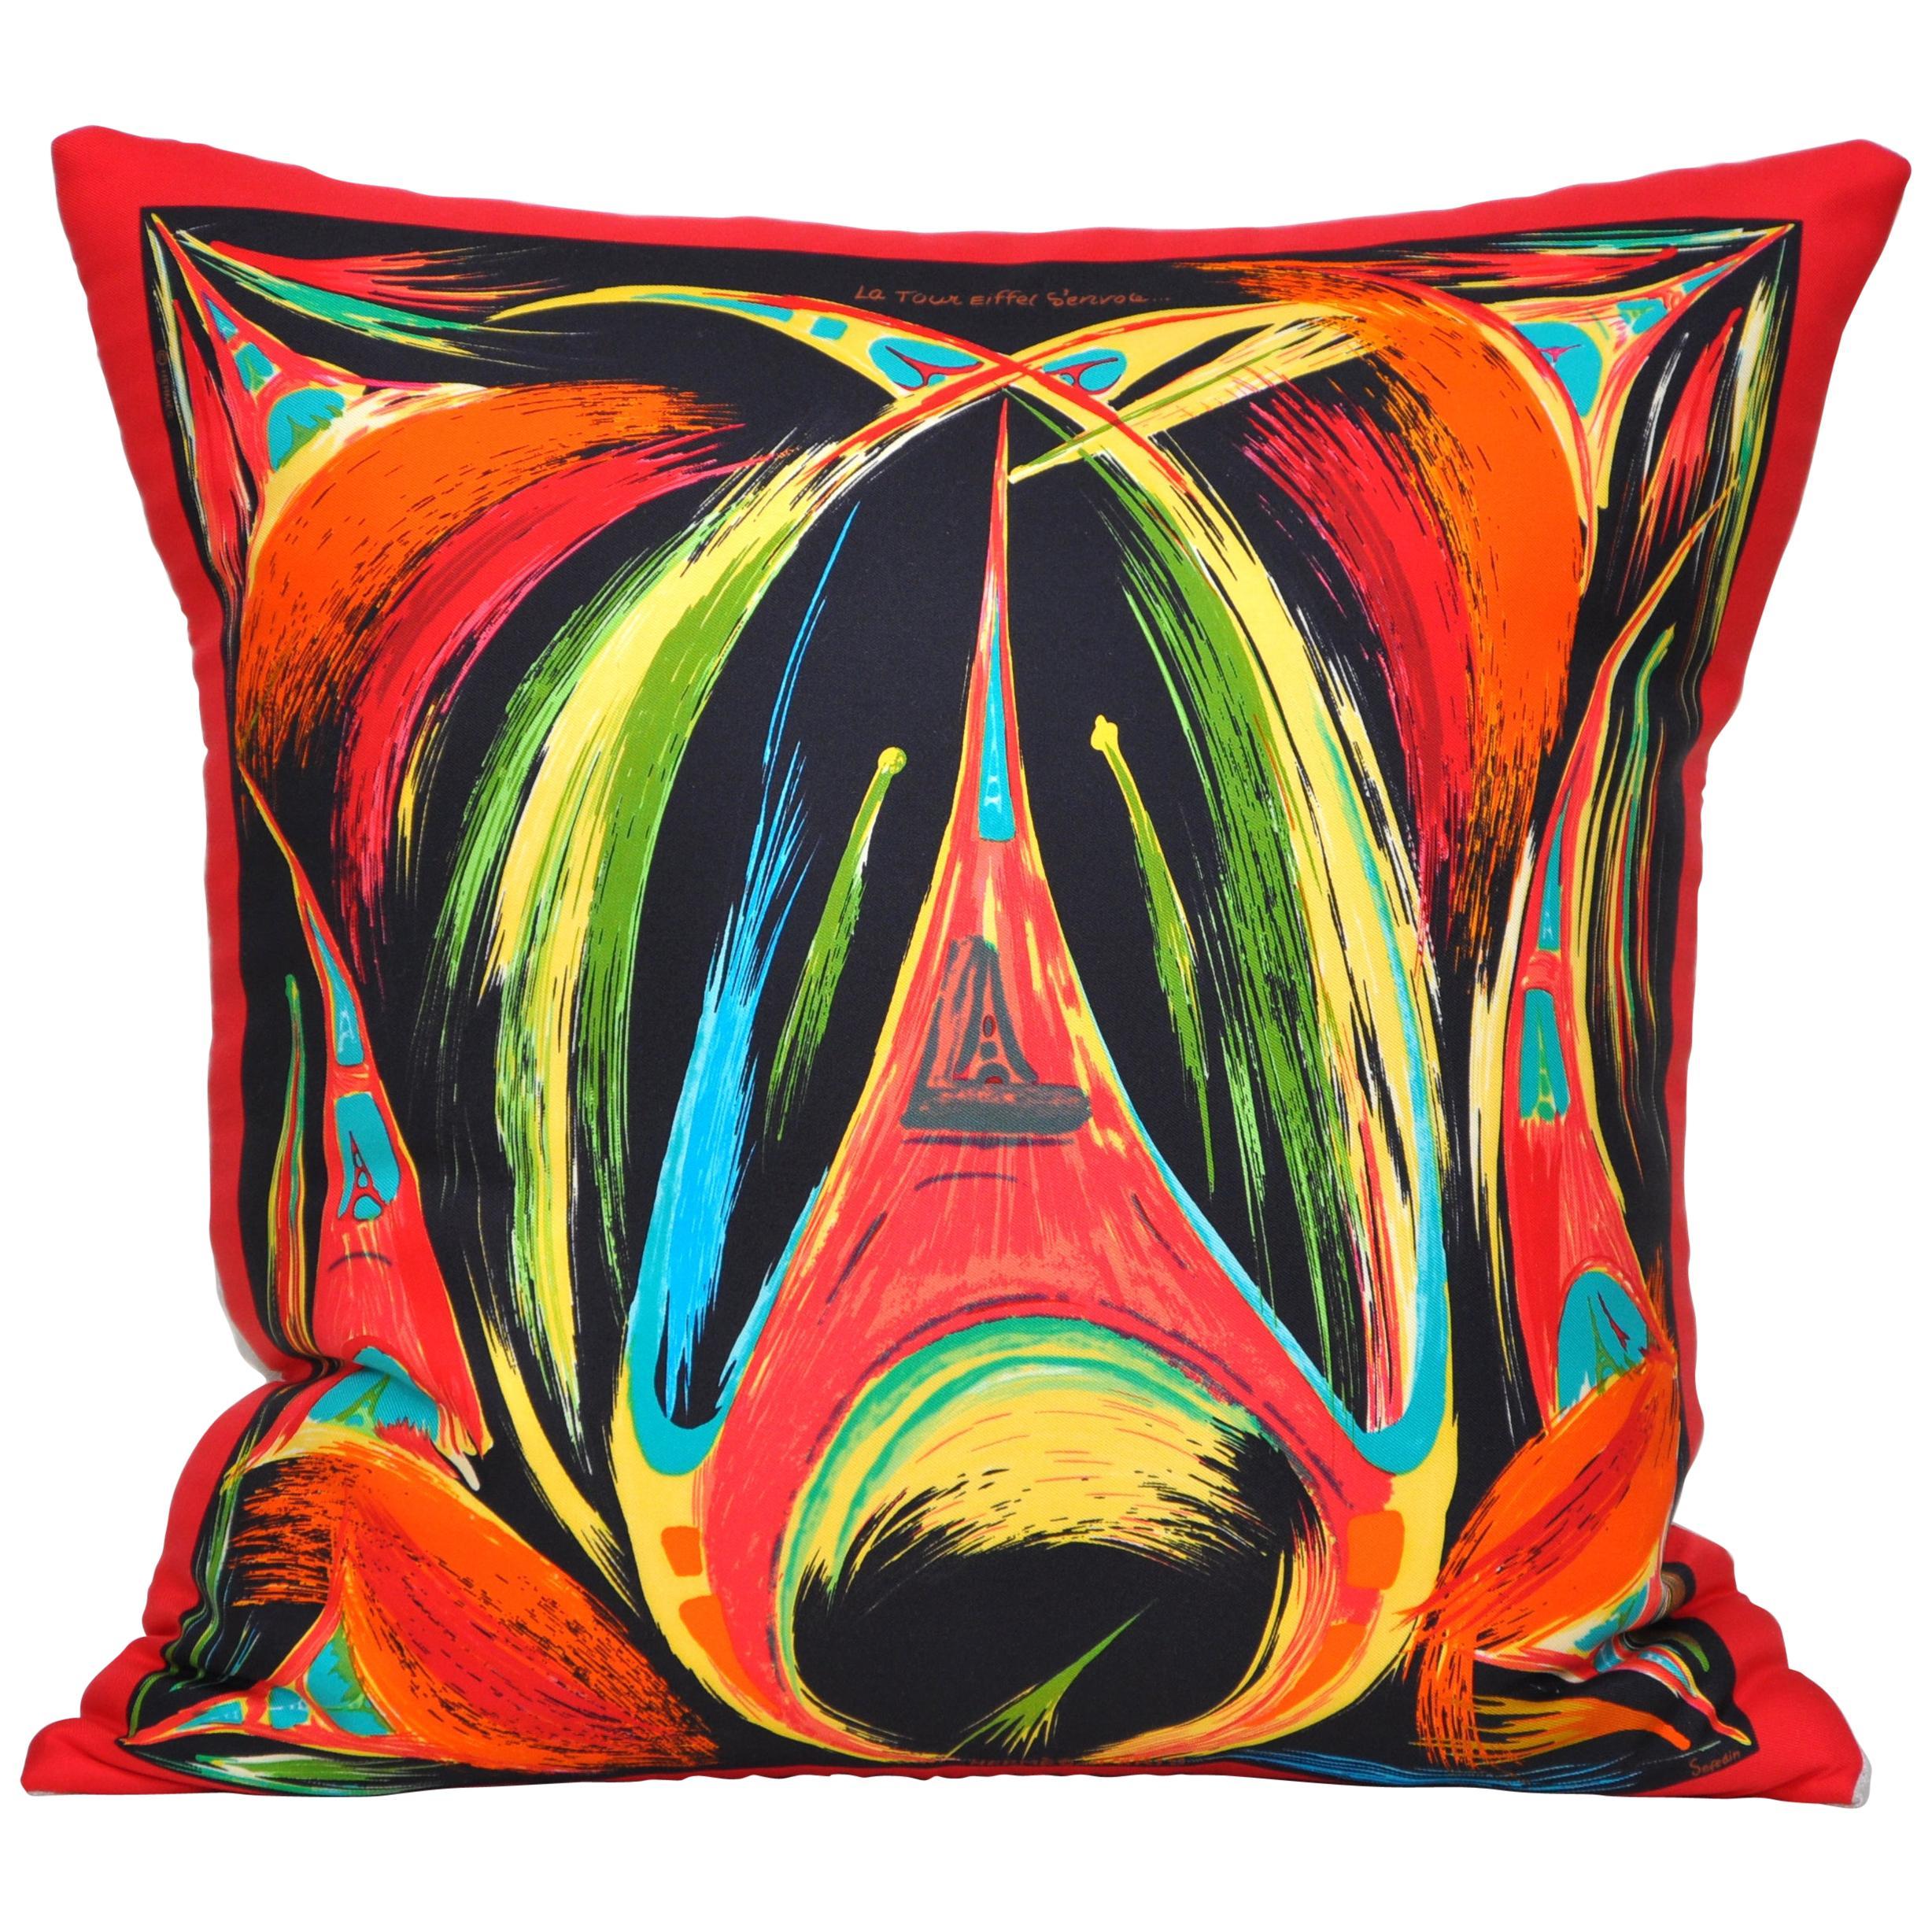 Vintage Hermès Eiffel Tower Paris Silk Scarf and Irish Linen Cushion Pillow